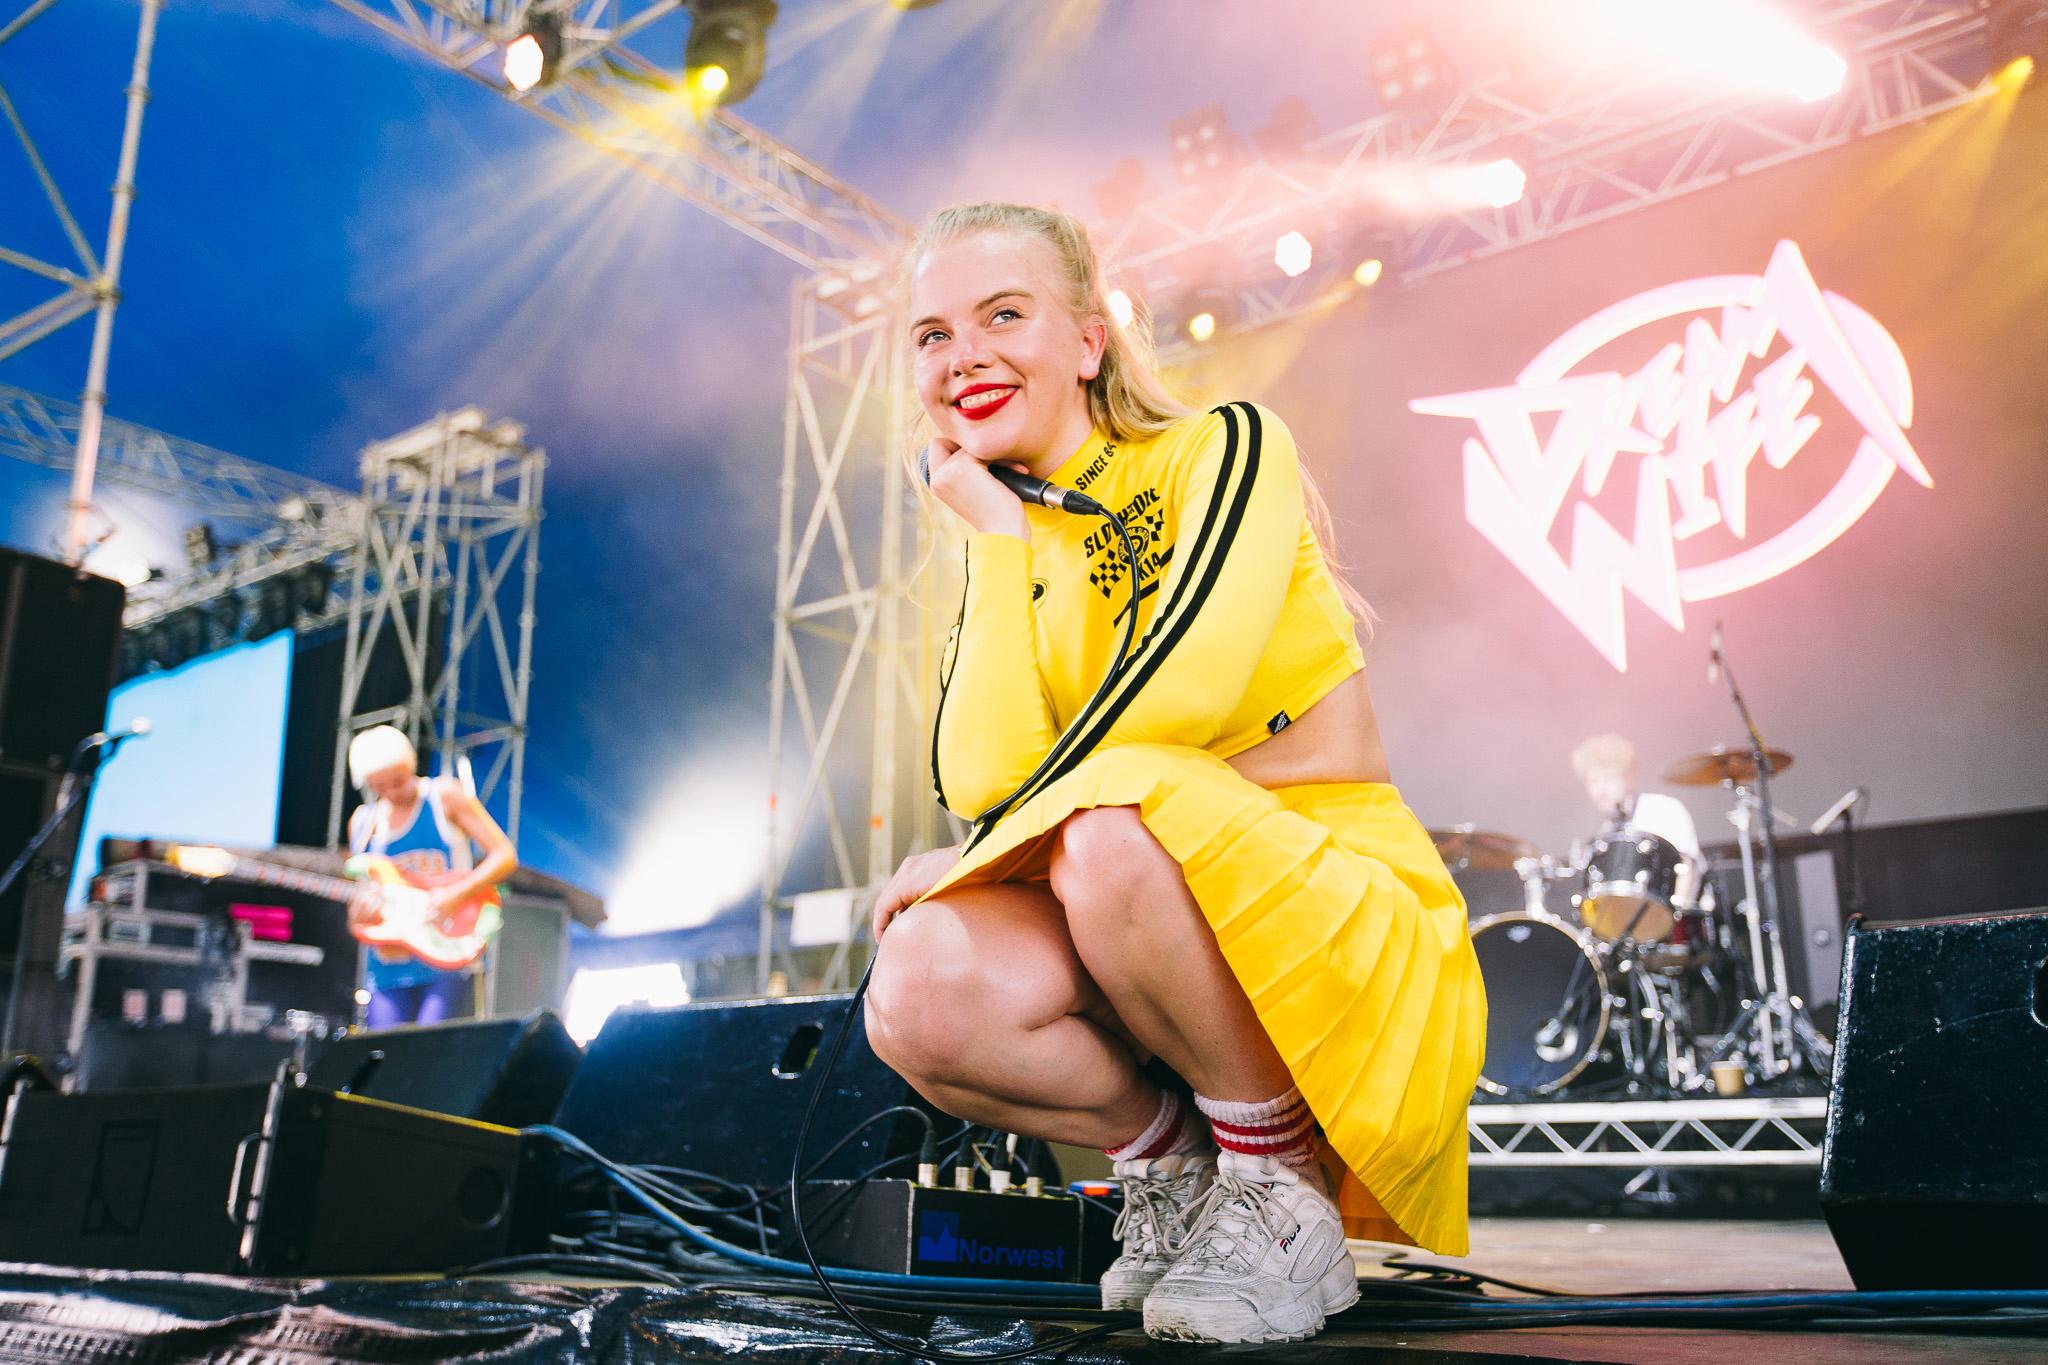 Dream Wife_Laneway-Festival-Brisbane-2018_Credit-Bianca-Holderness-11.jpg